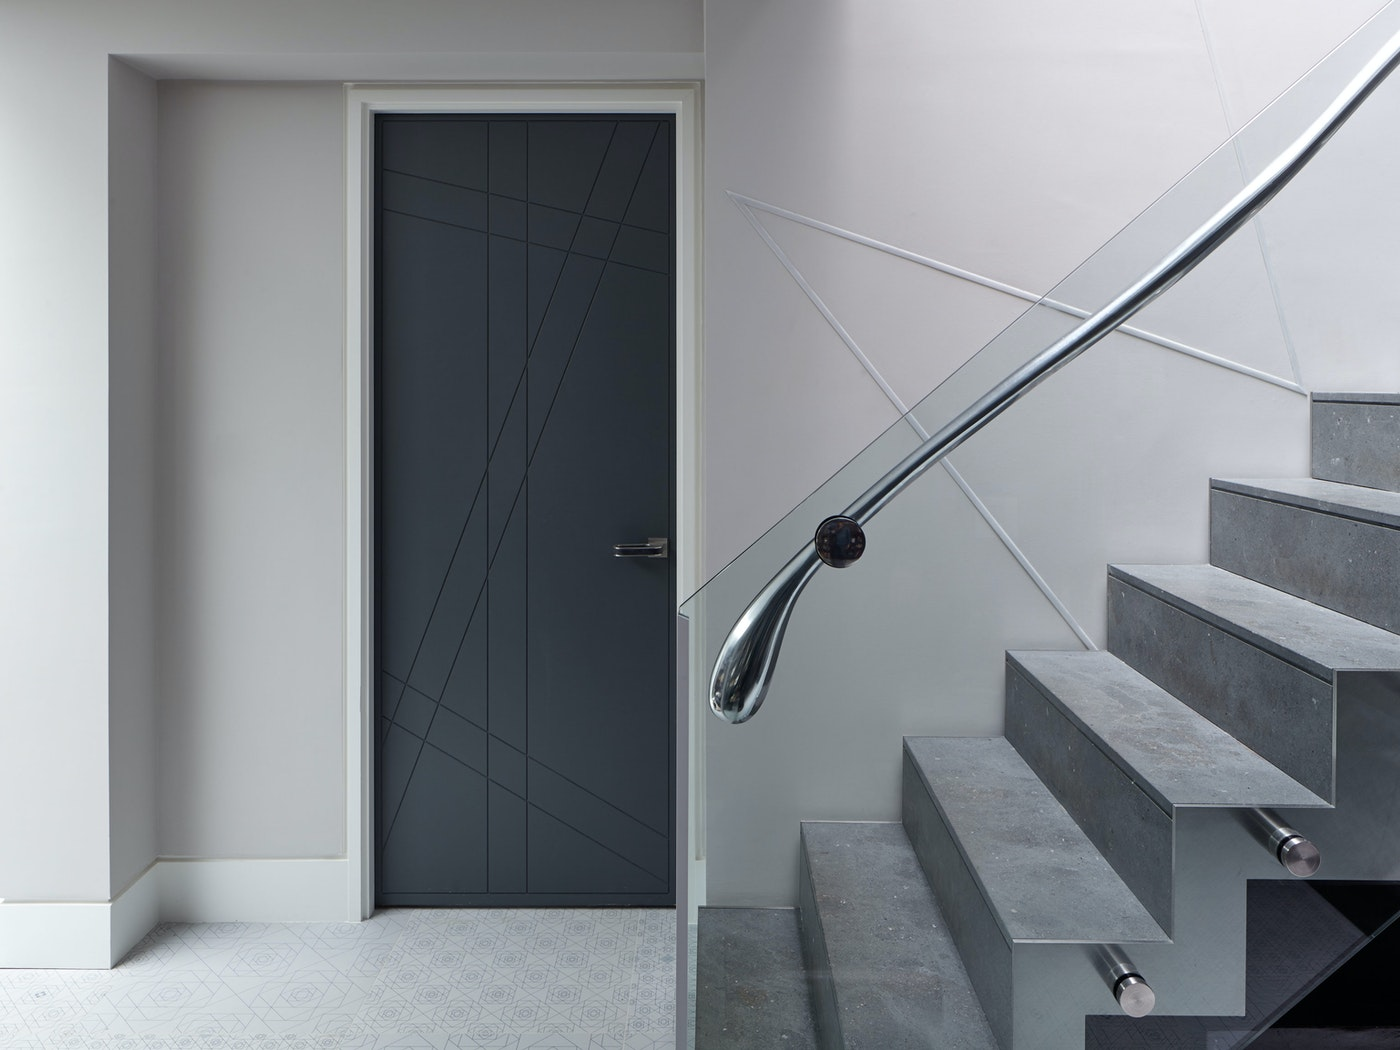 Interior anthracite grey door & staircase